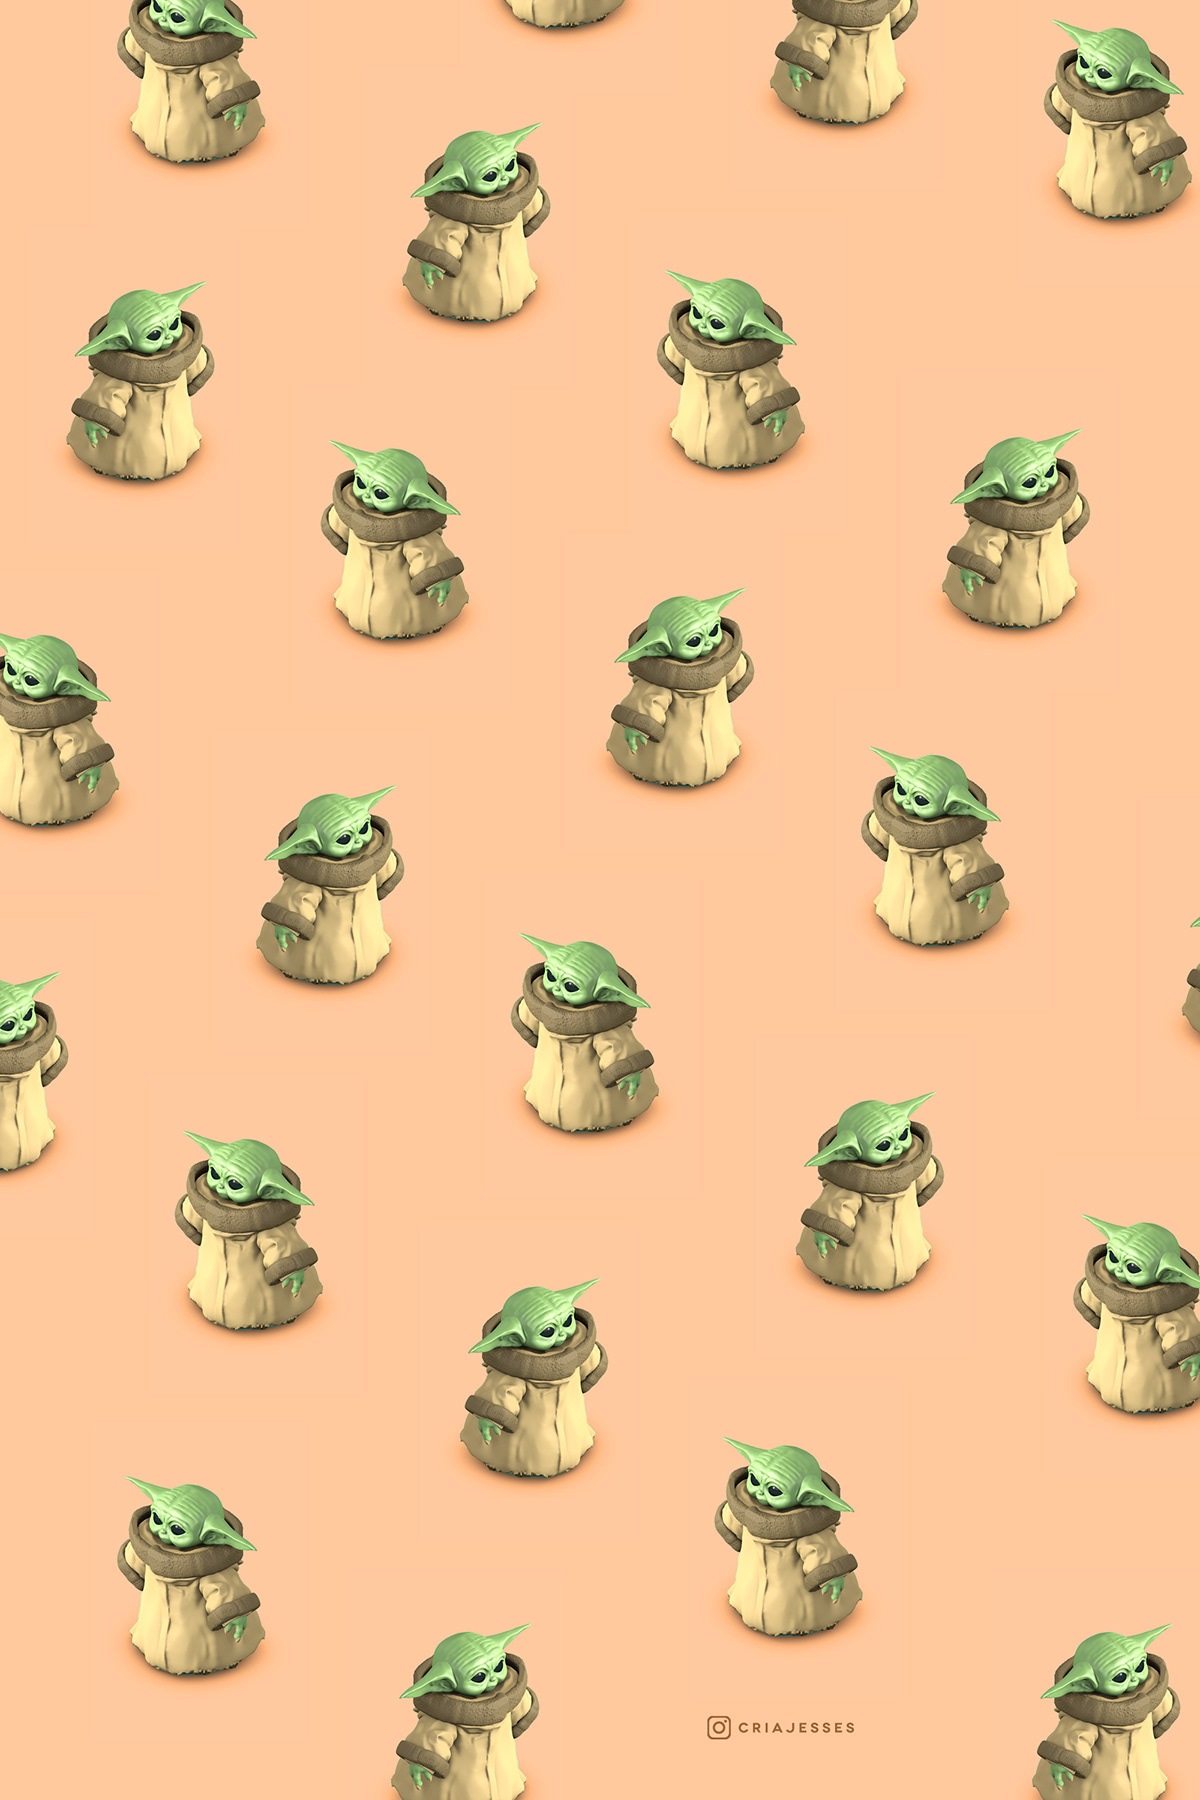 Baby Yoda Wallpaper on Behance